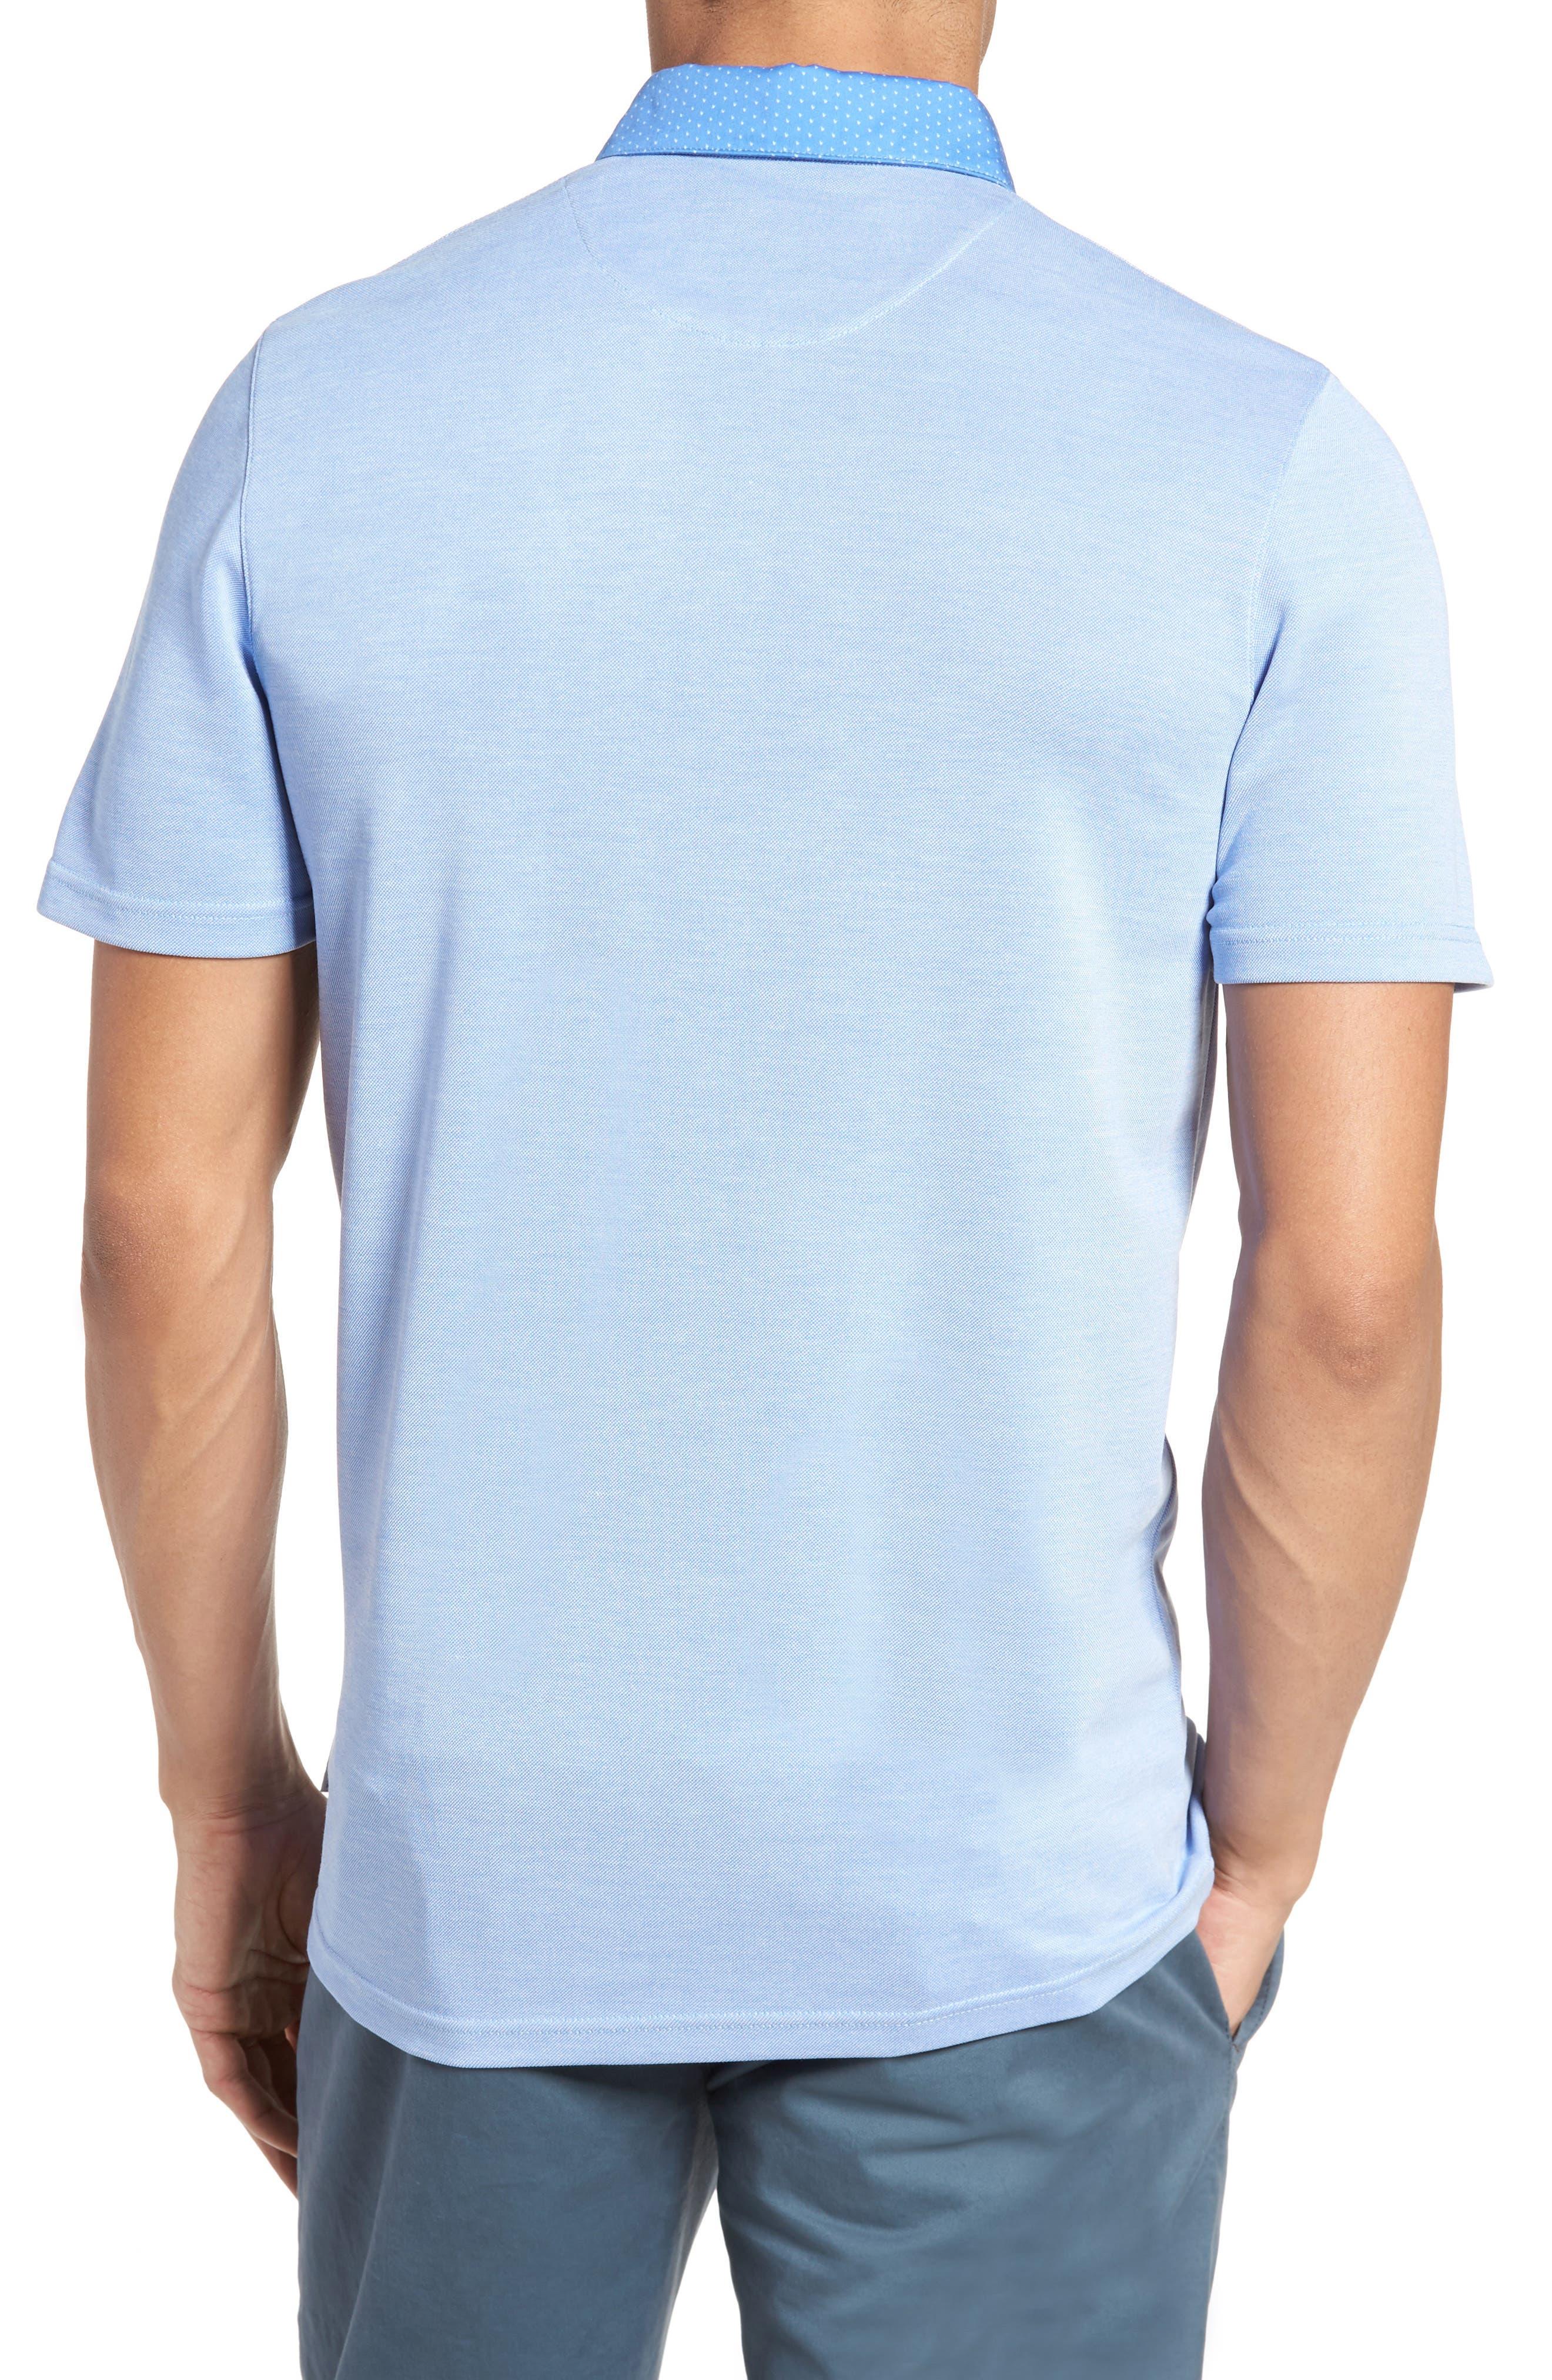 Mikeytt Trim Fit Polo,                             Alternate thumbnail 2, color,                             Bright Blue